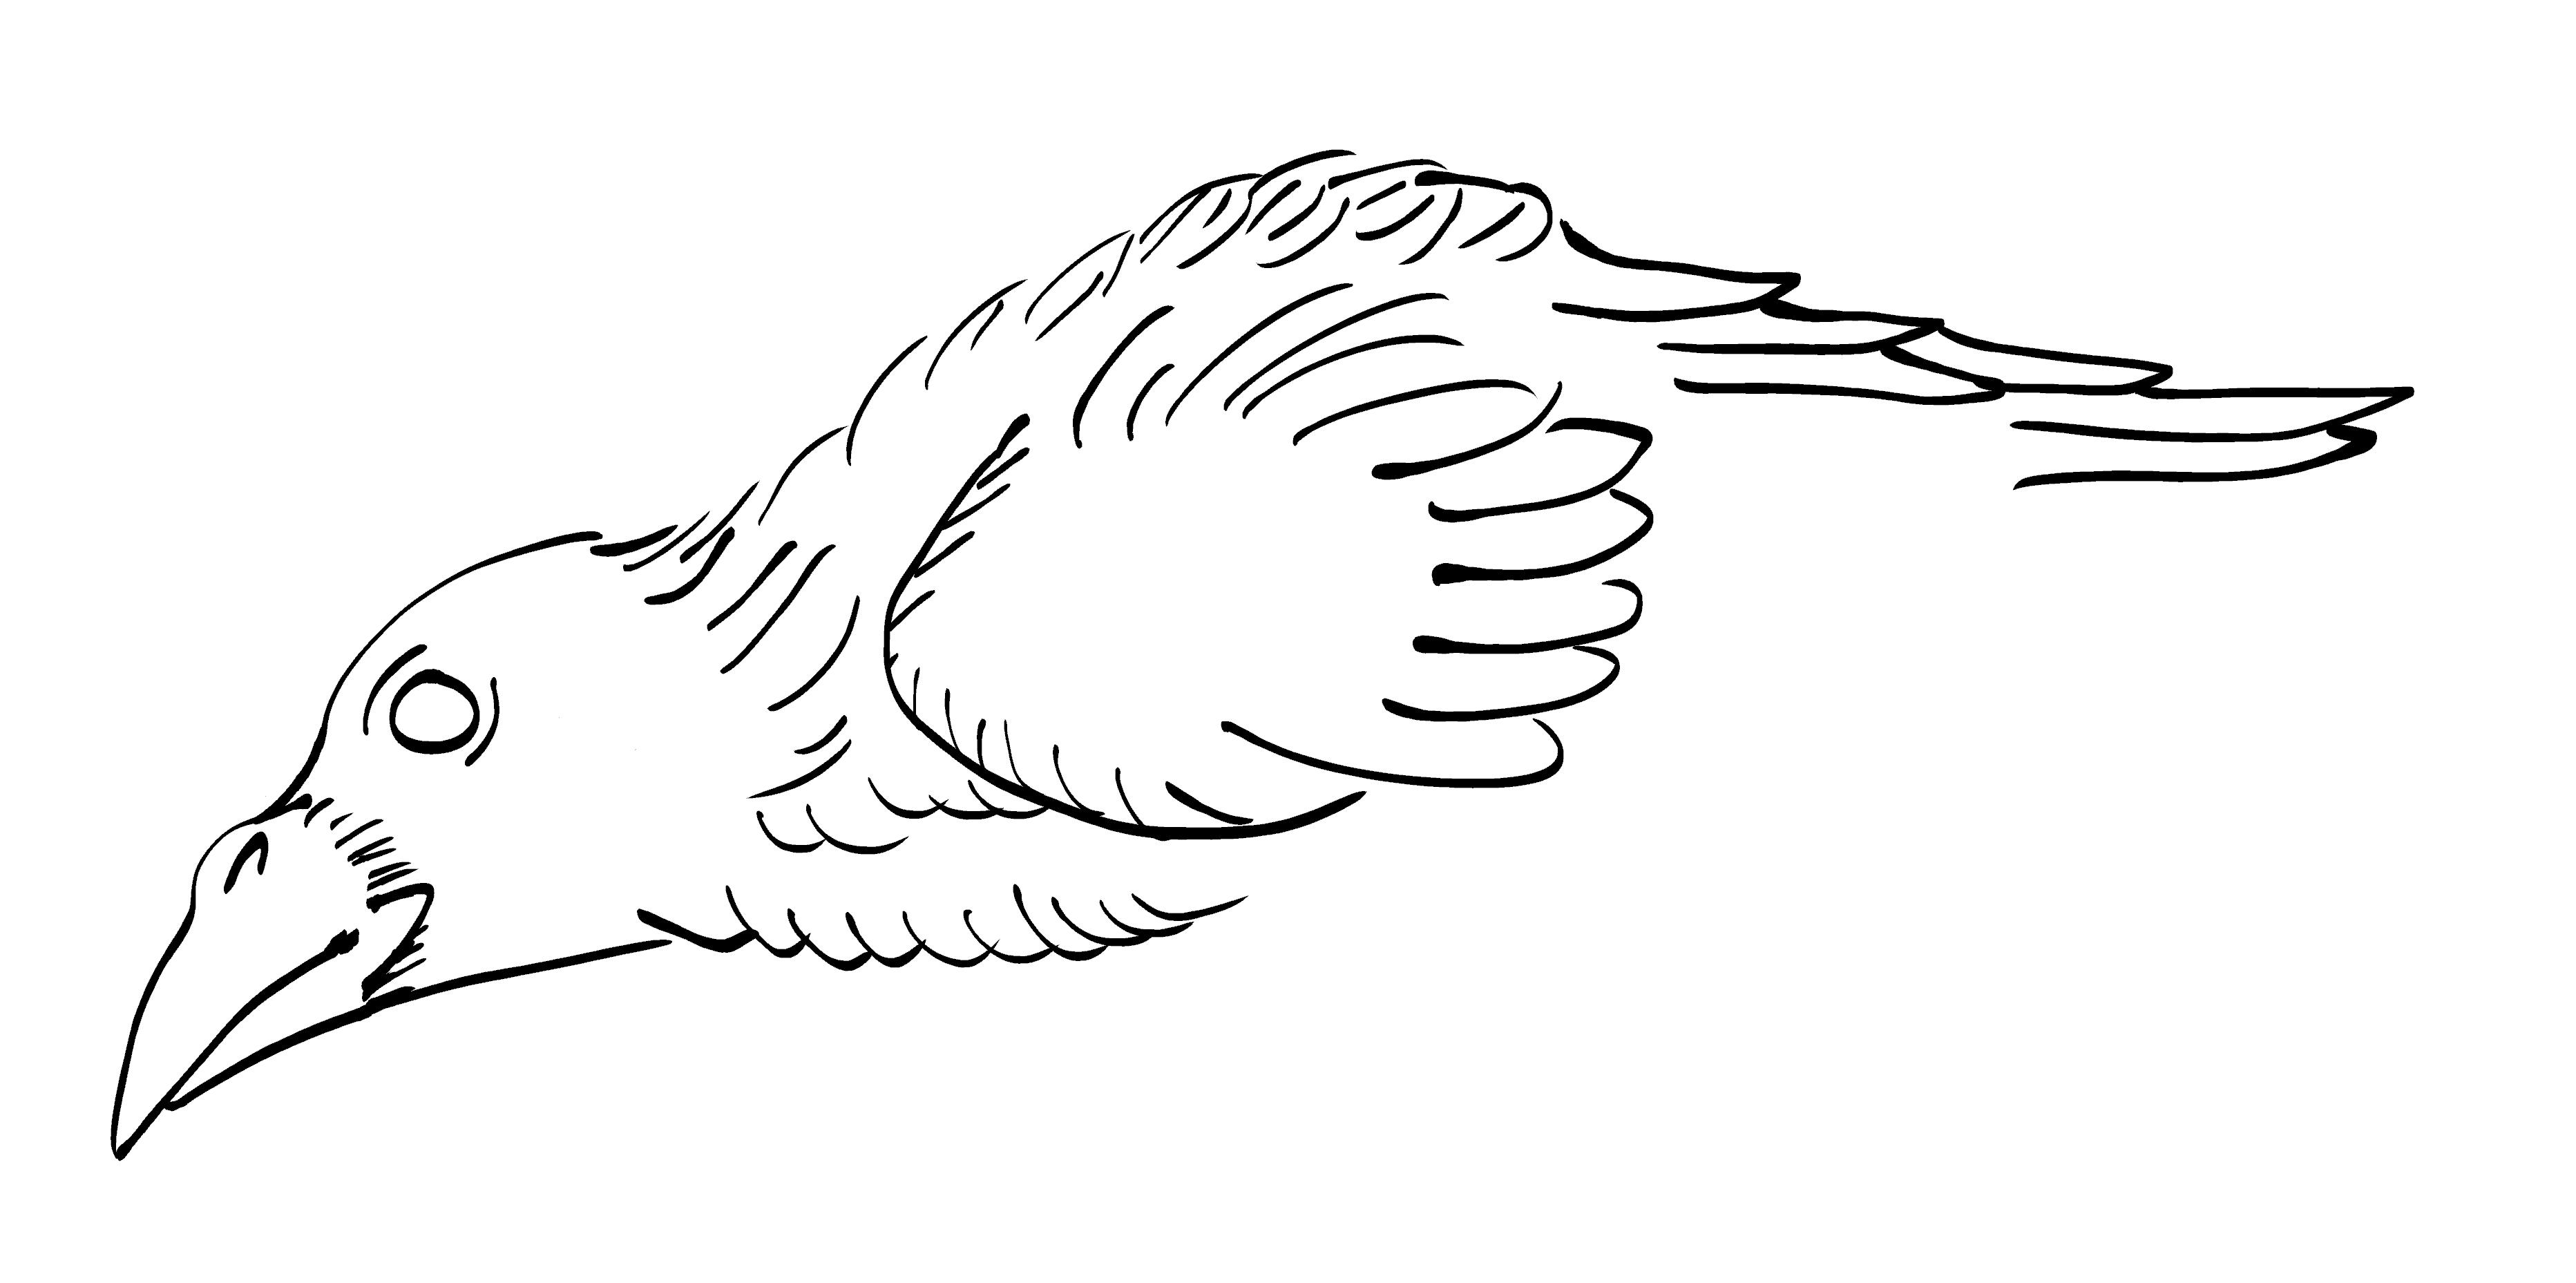 Crow Raven -ukiyo-e BlackandWhite4-(からす) by RedSparkle (11-2019)